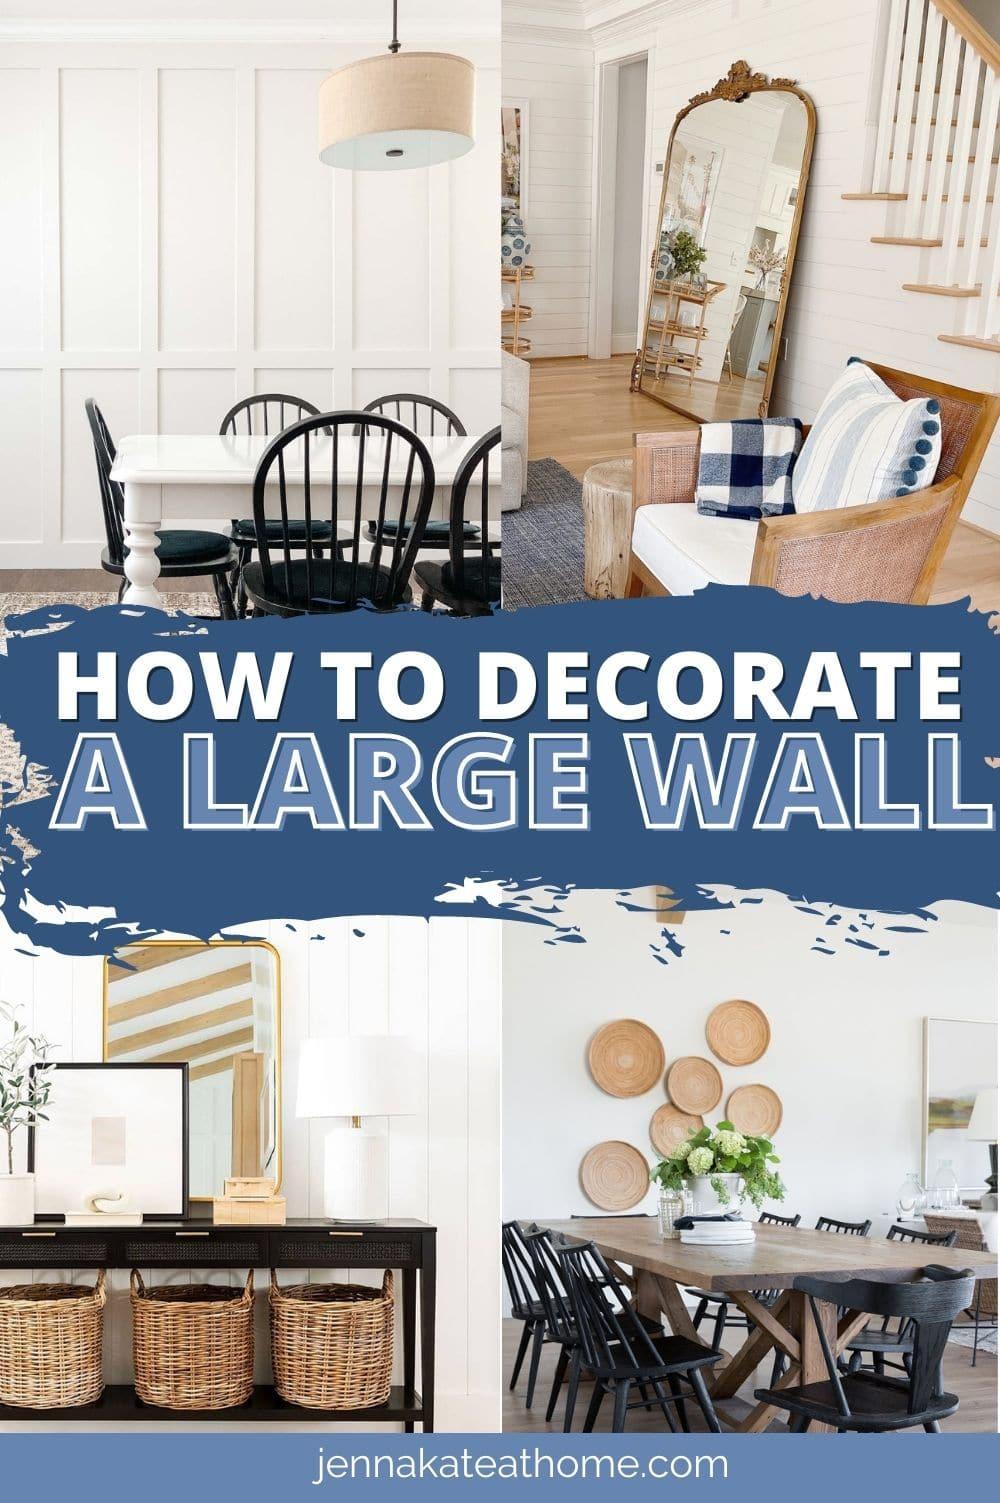 decorate large wall pin image